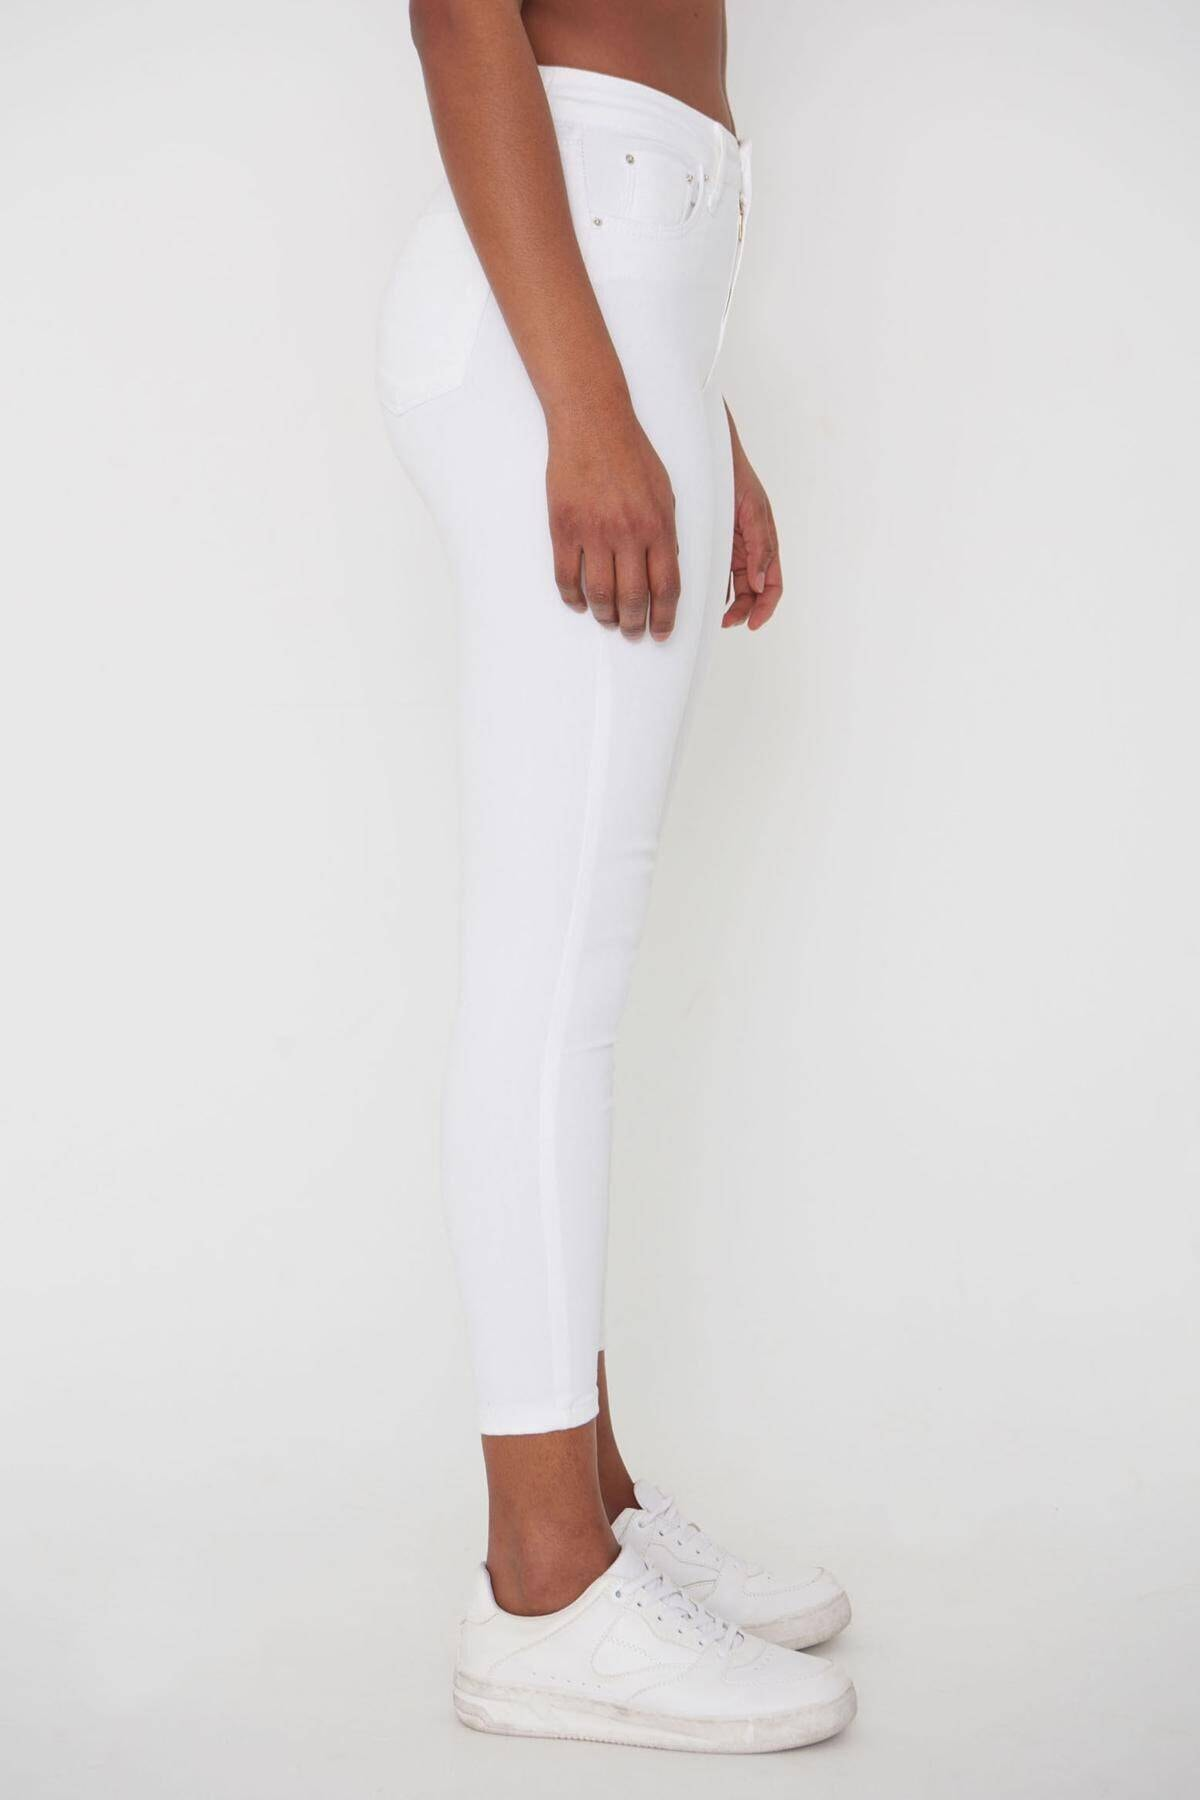 Addax Kadın Beyaz Pantolon Pn4424 - Pnj ADX-00008543 3